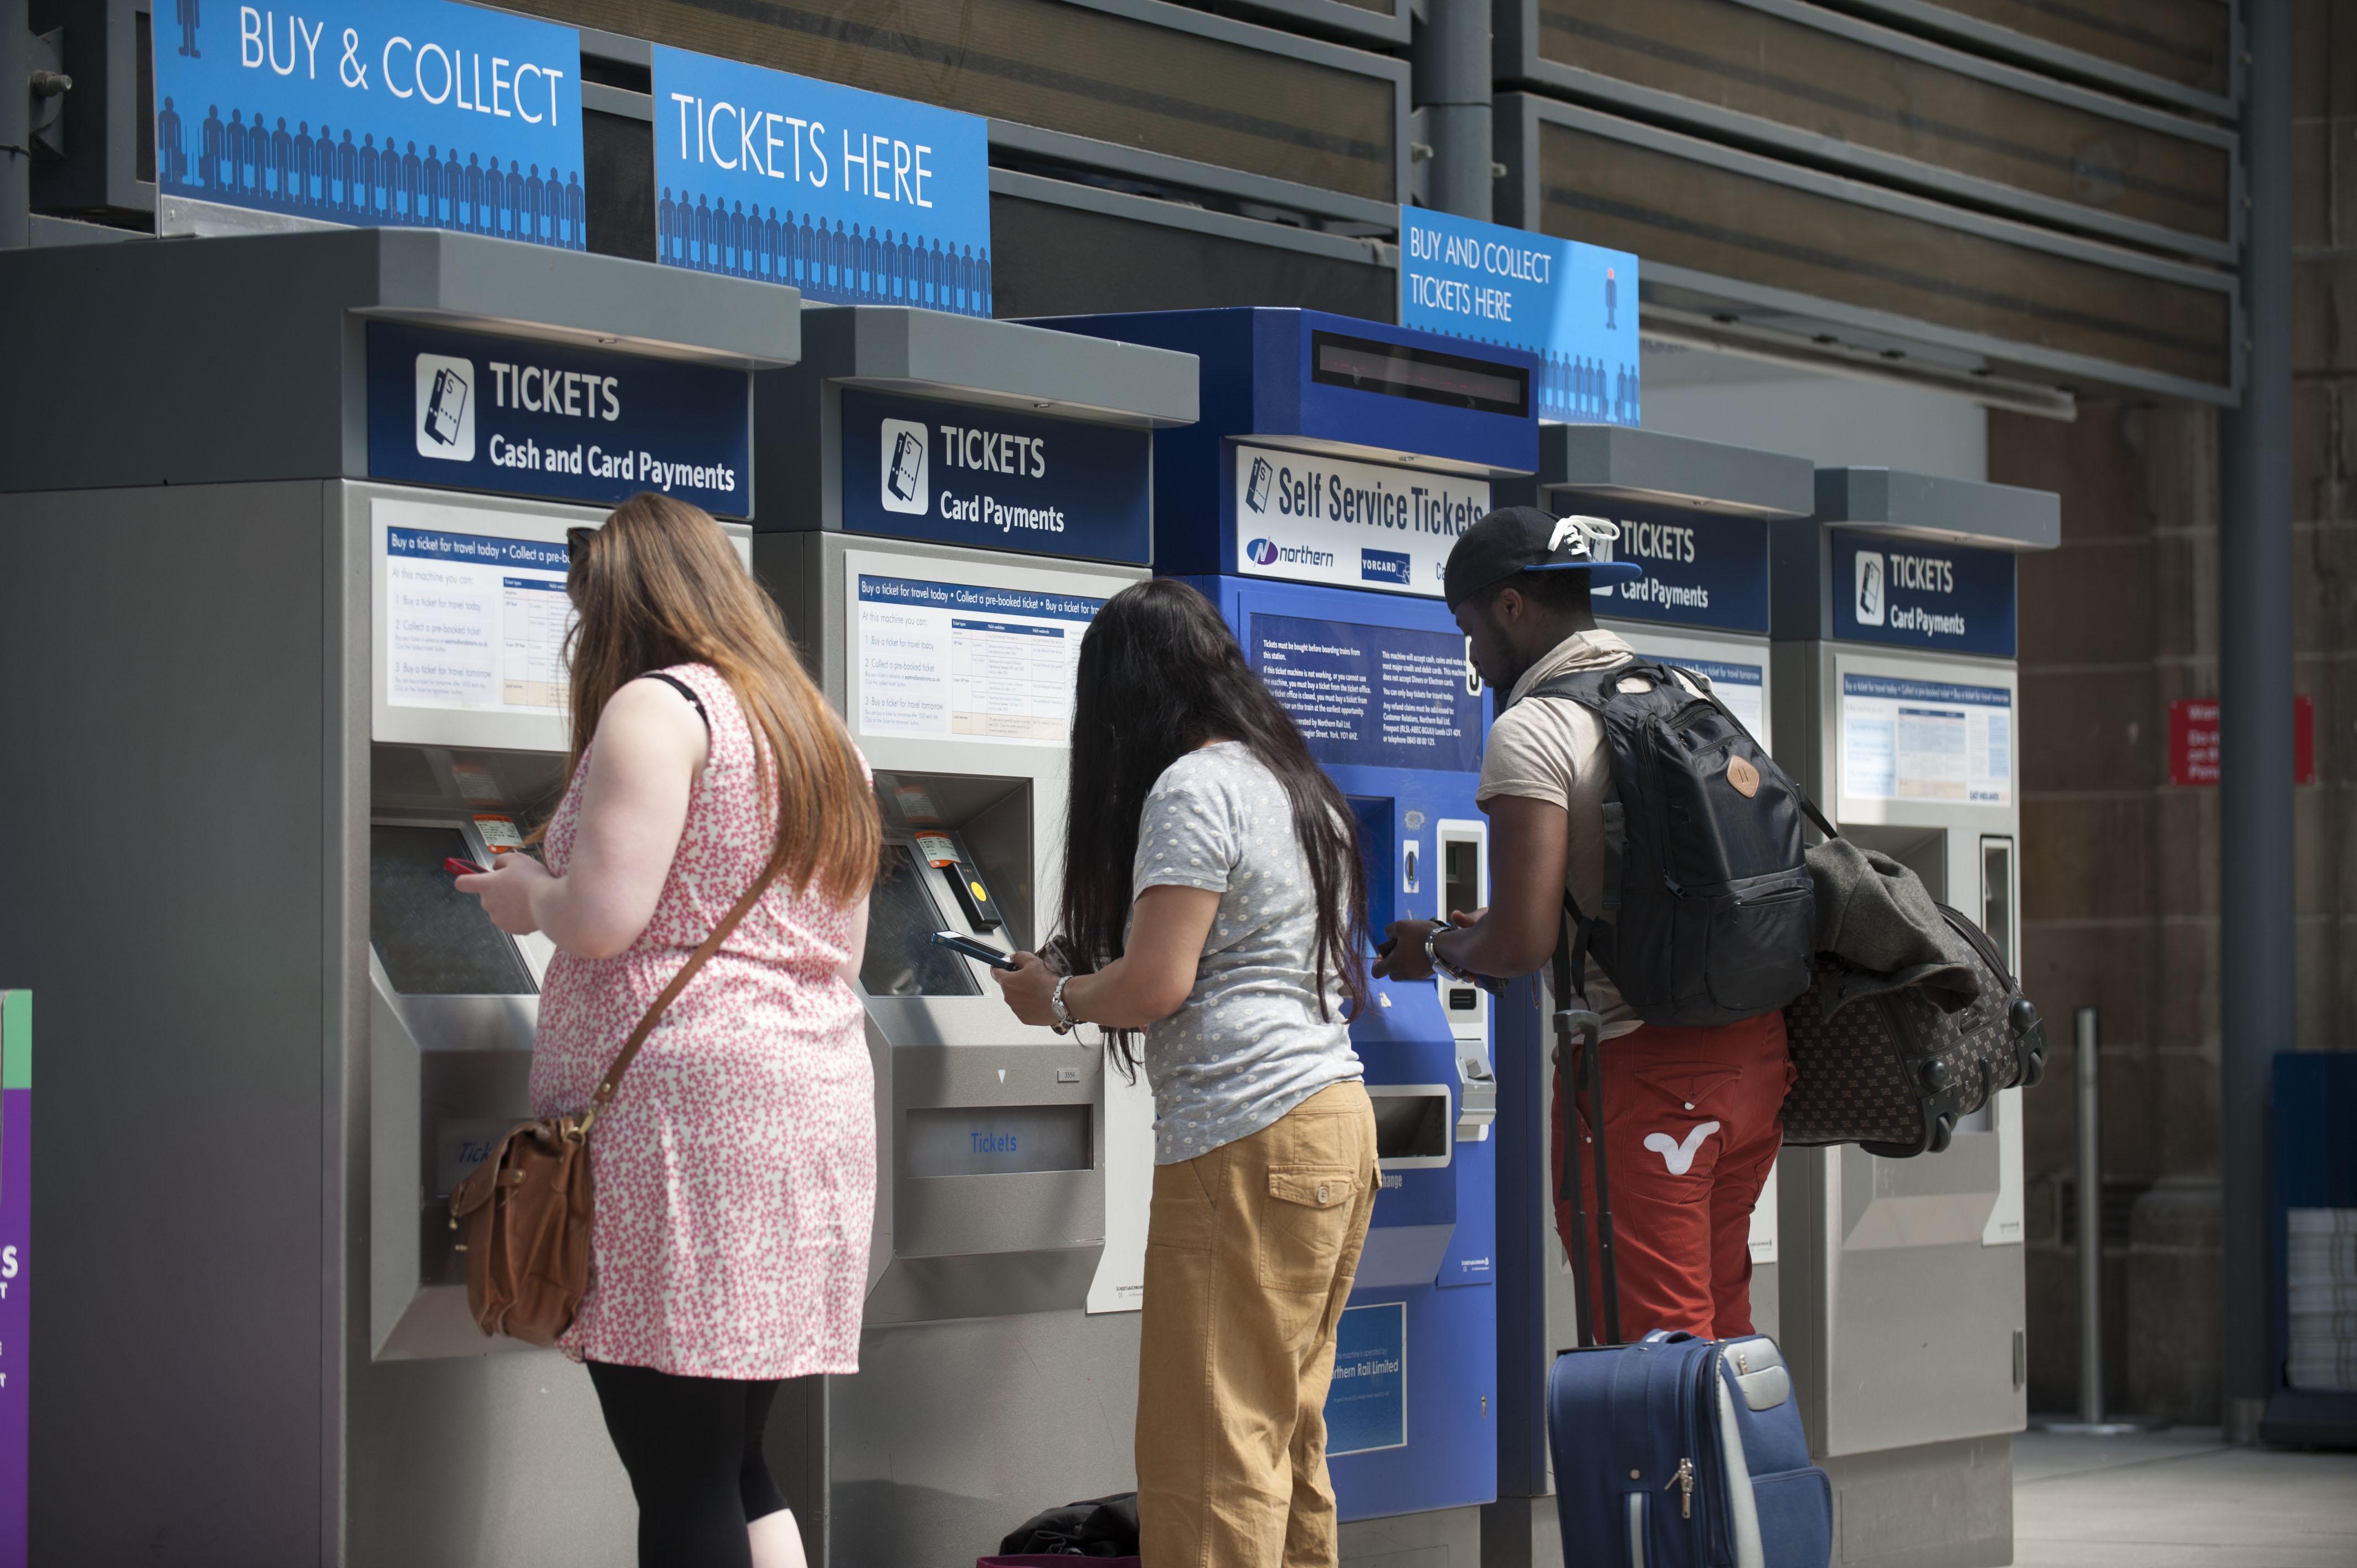 Passenger buying ticket